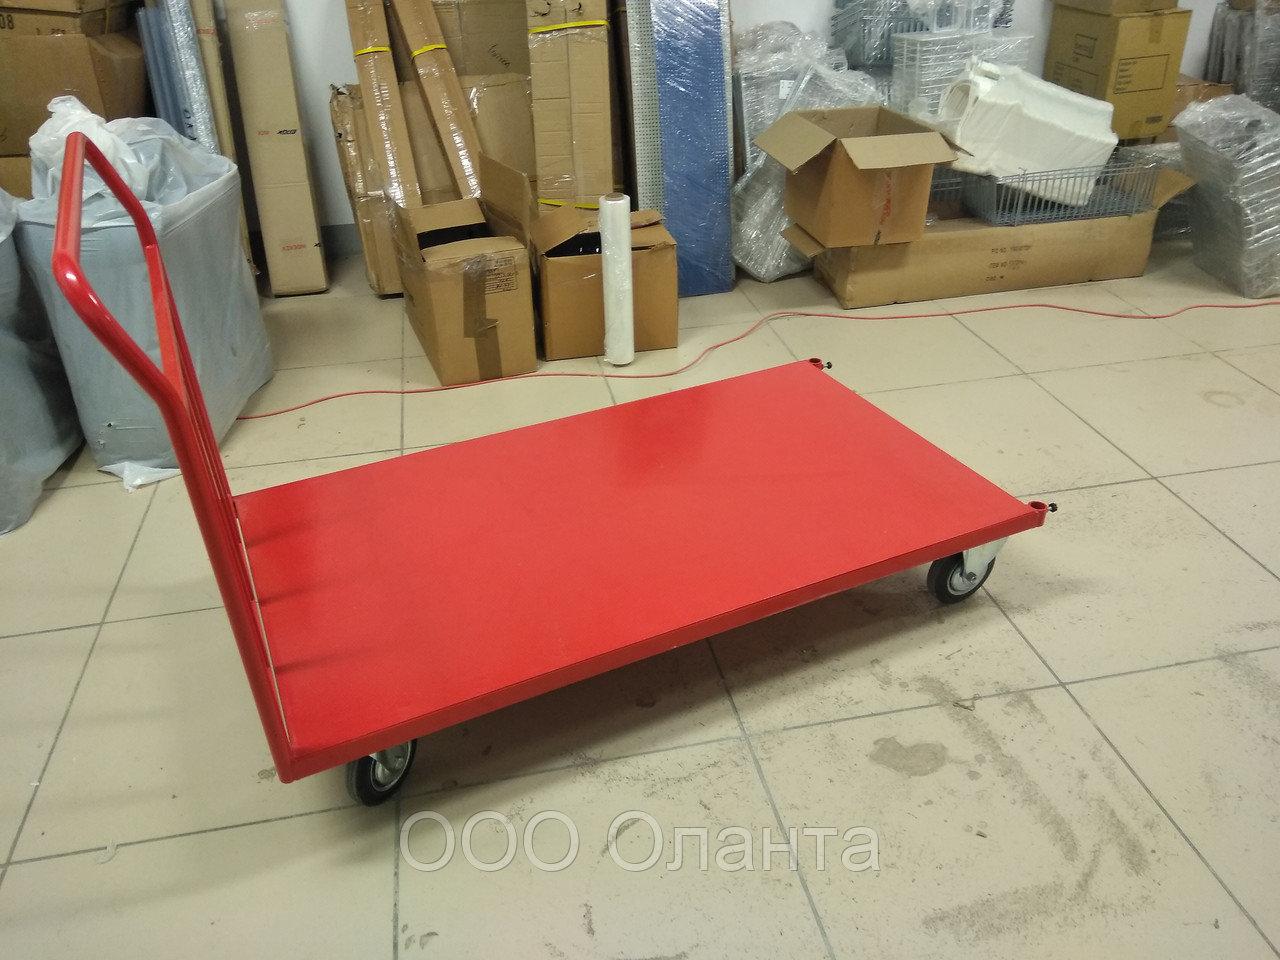 Тележка грузовая платформенная (1200х600 мм) до 450 кг арт. ТГПС12.60